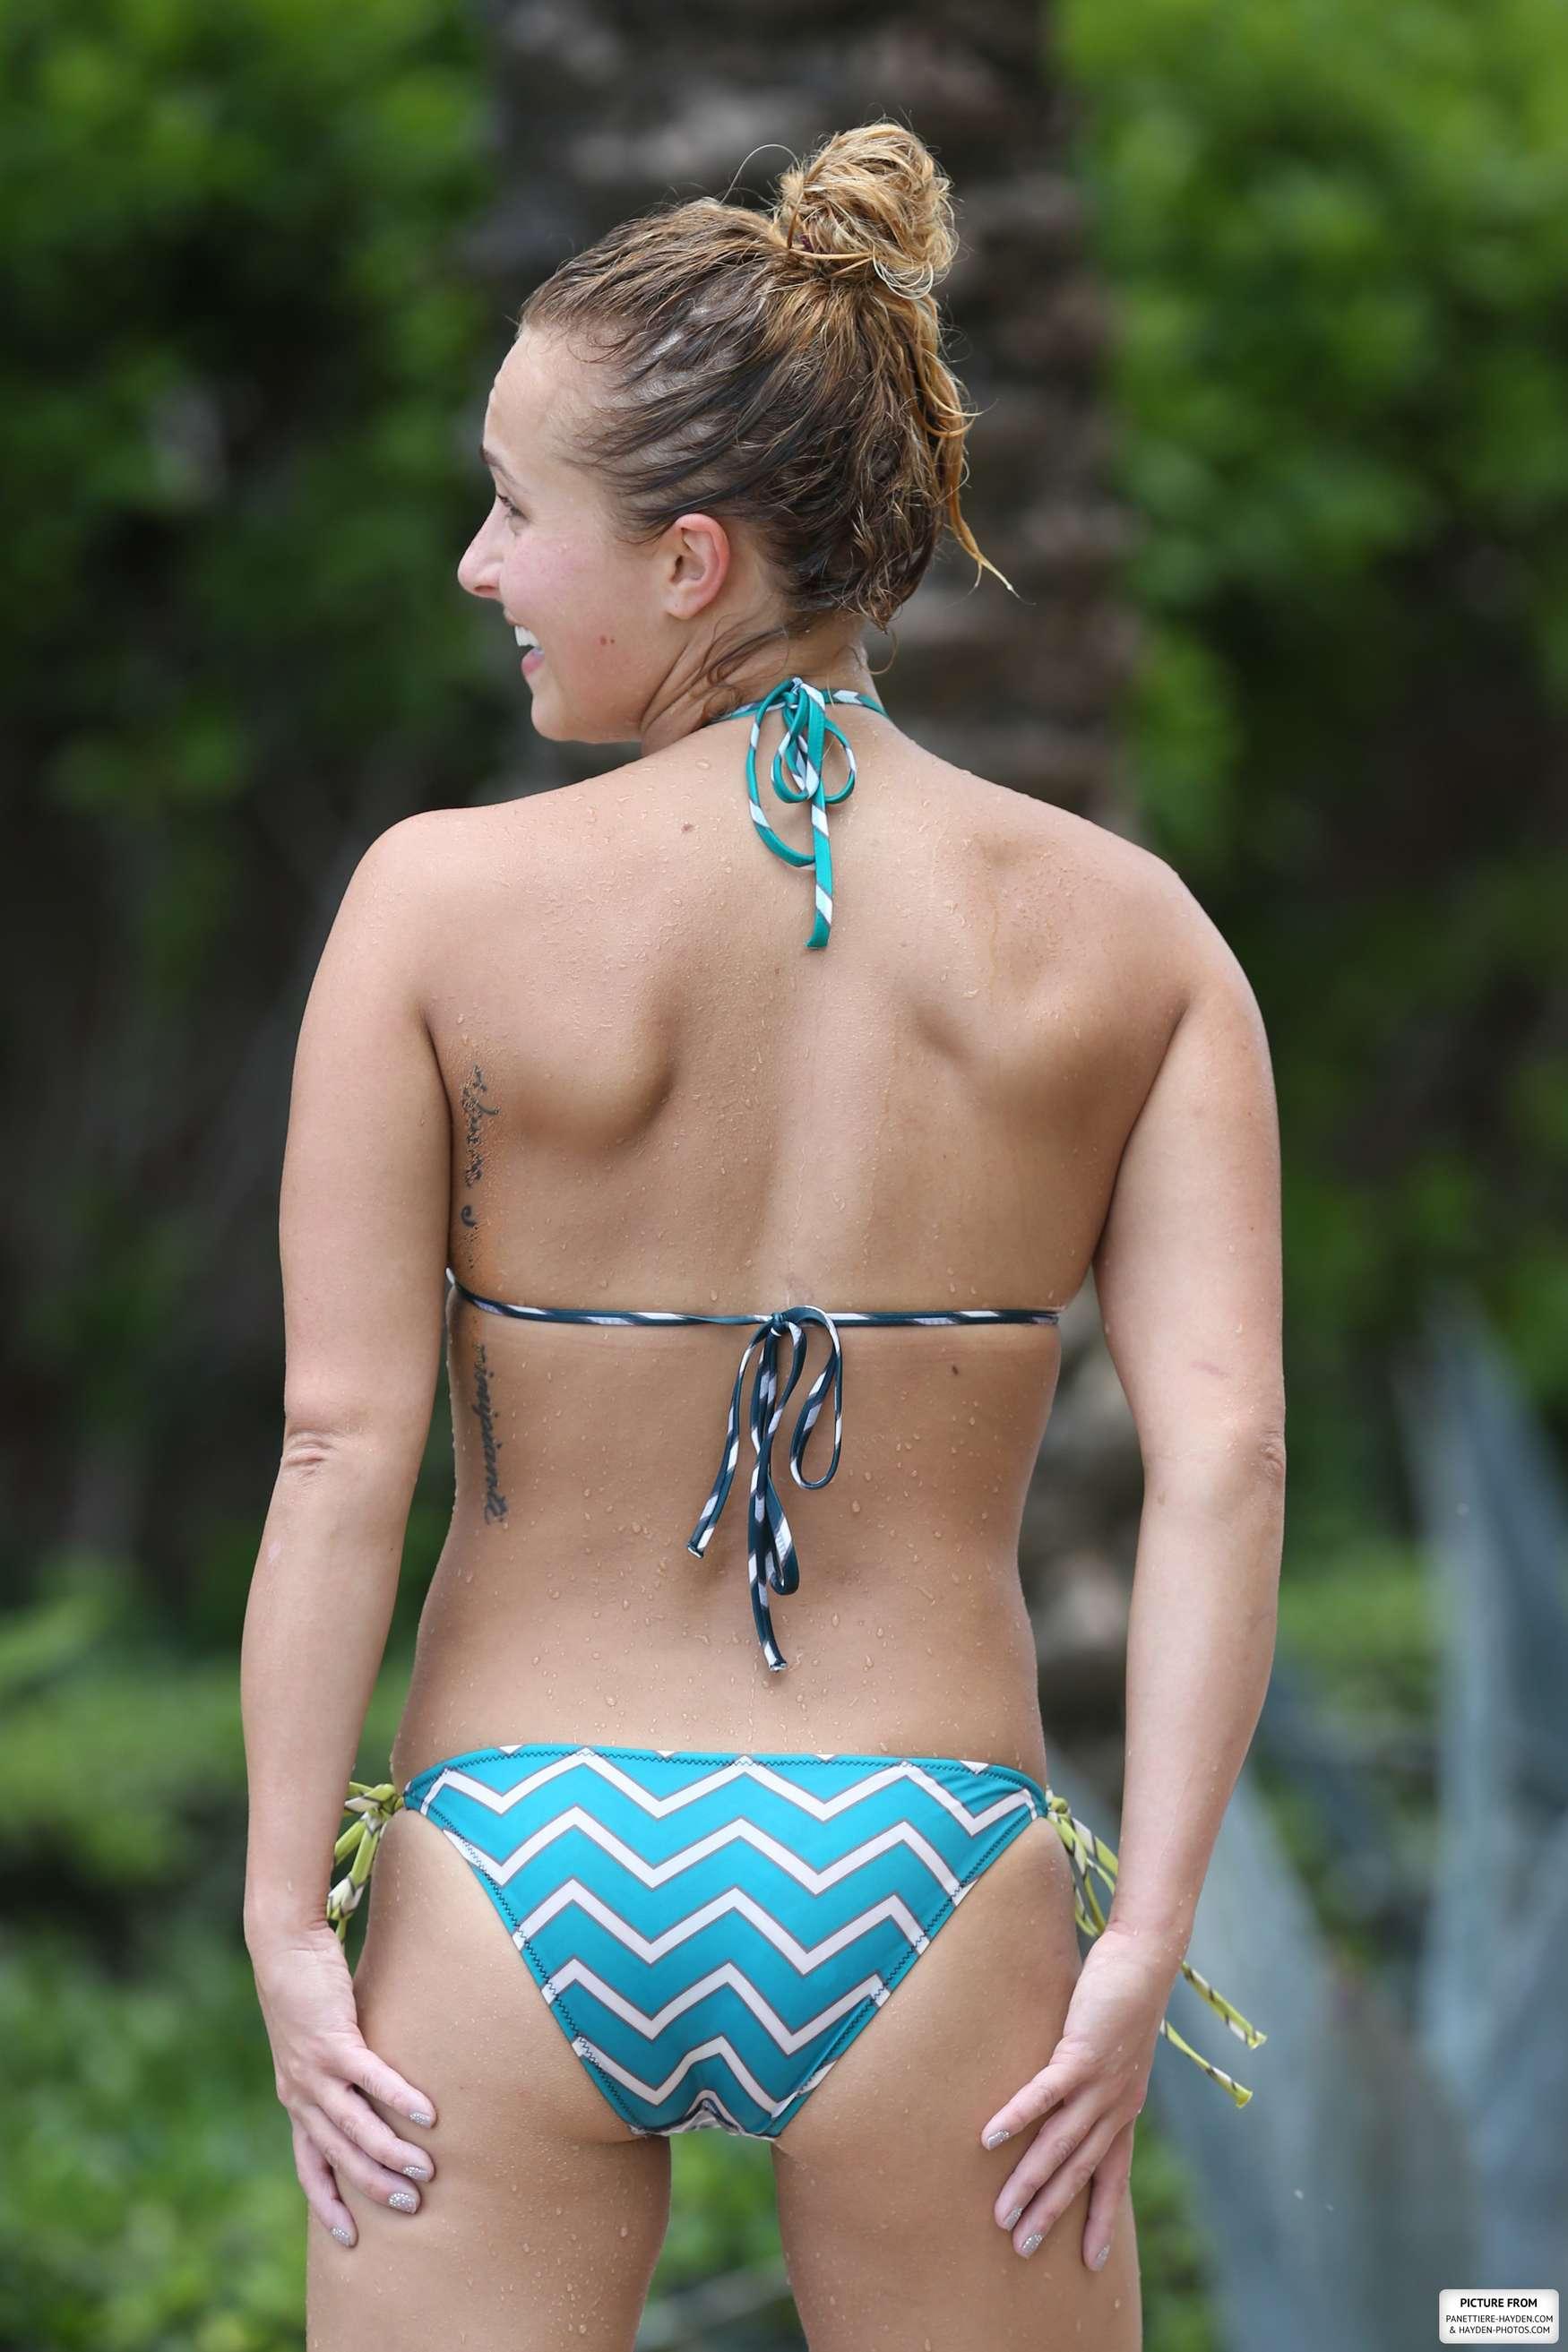 Bikini hayden panettiere pic